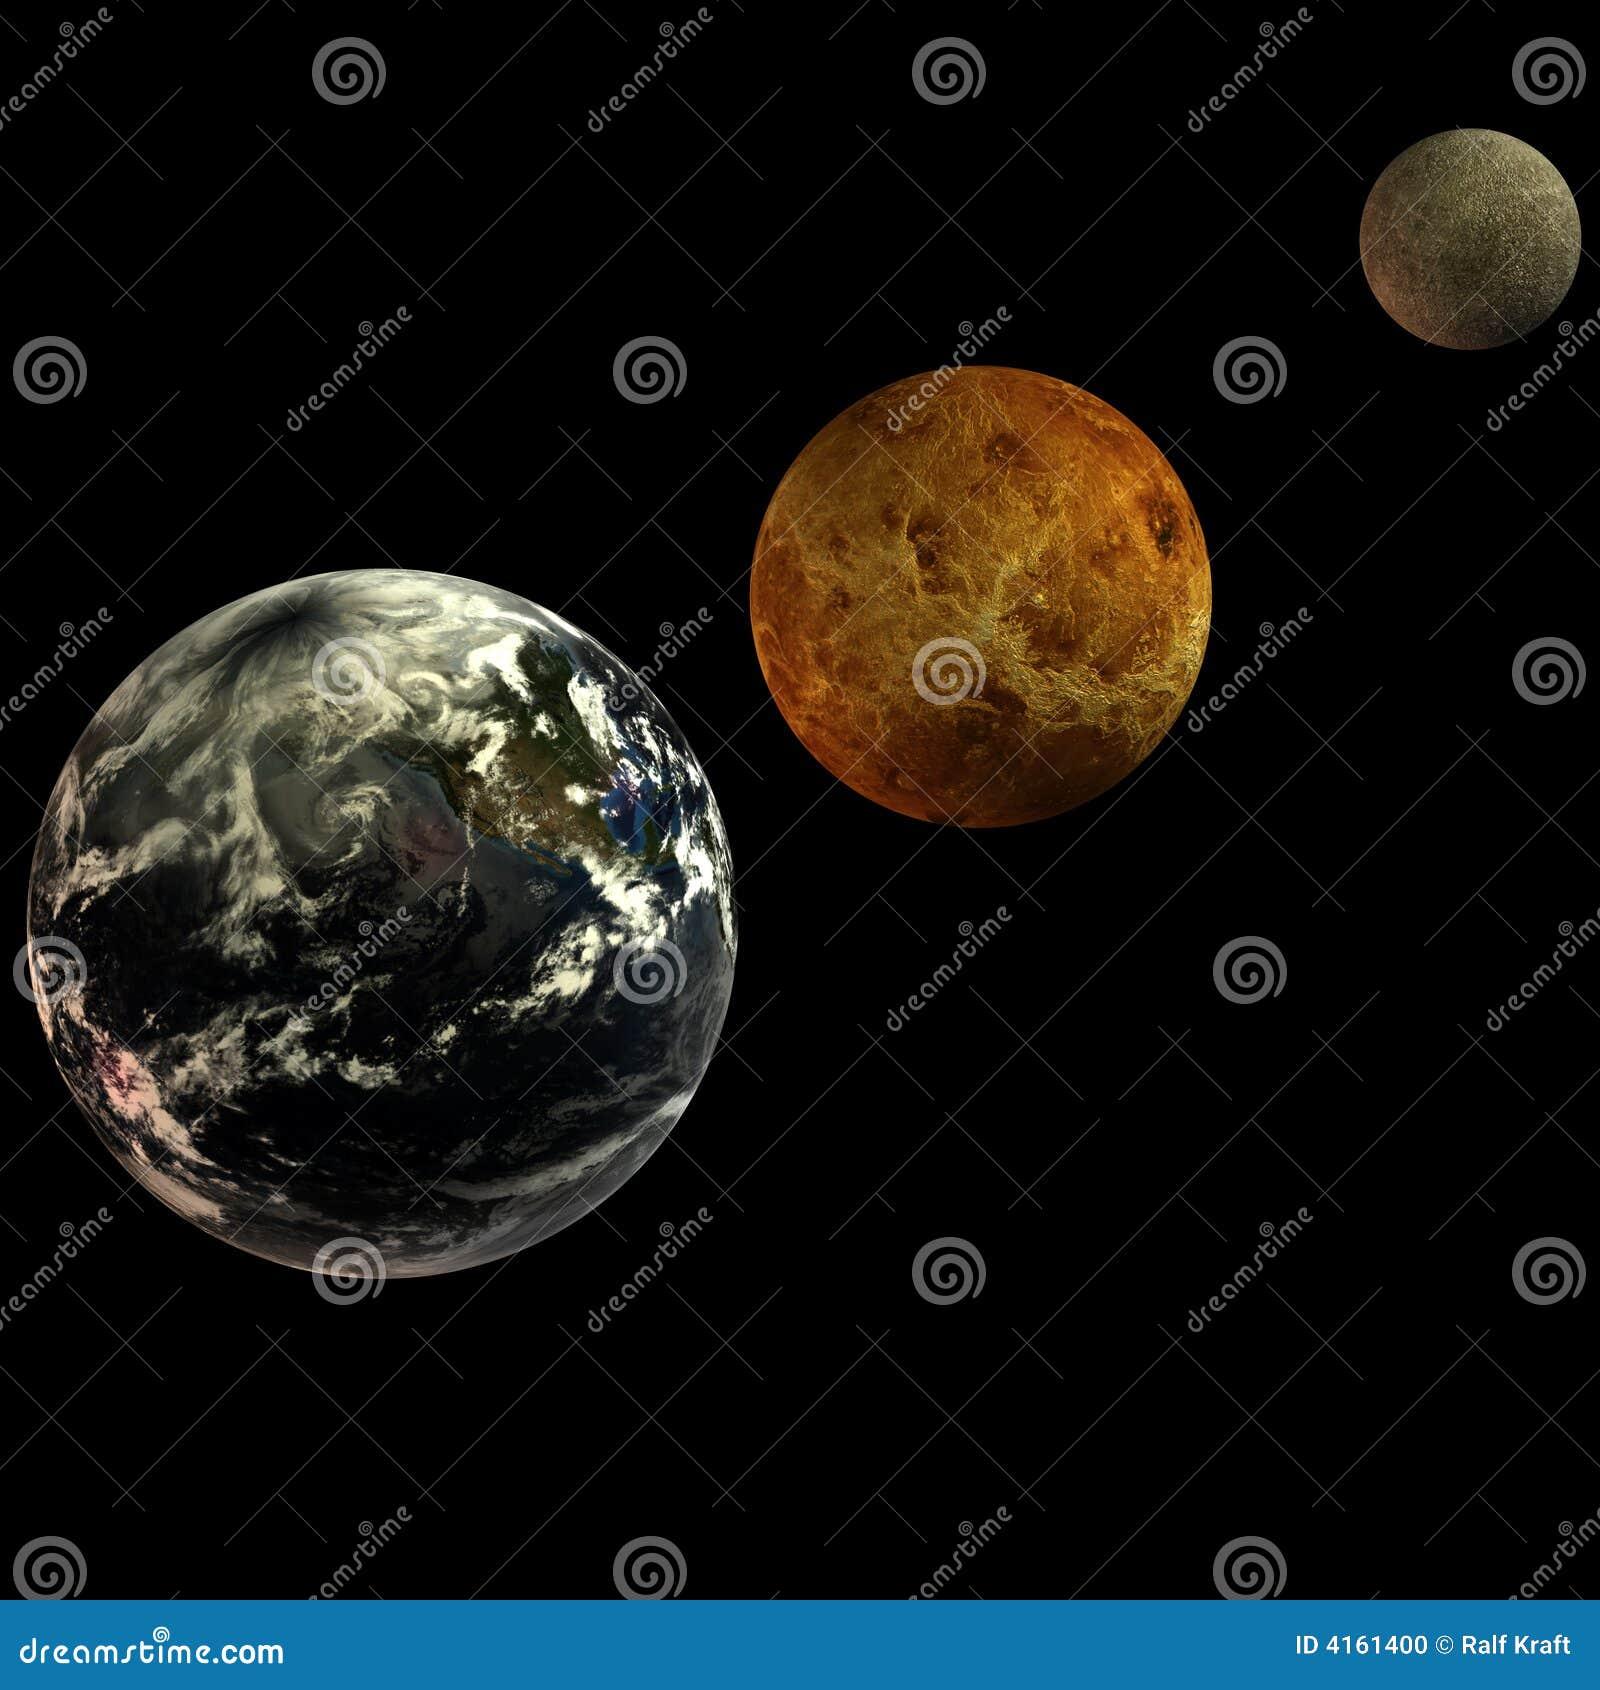 solar system paths - photo #34